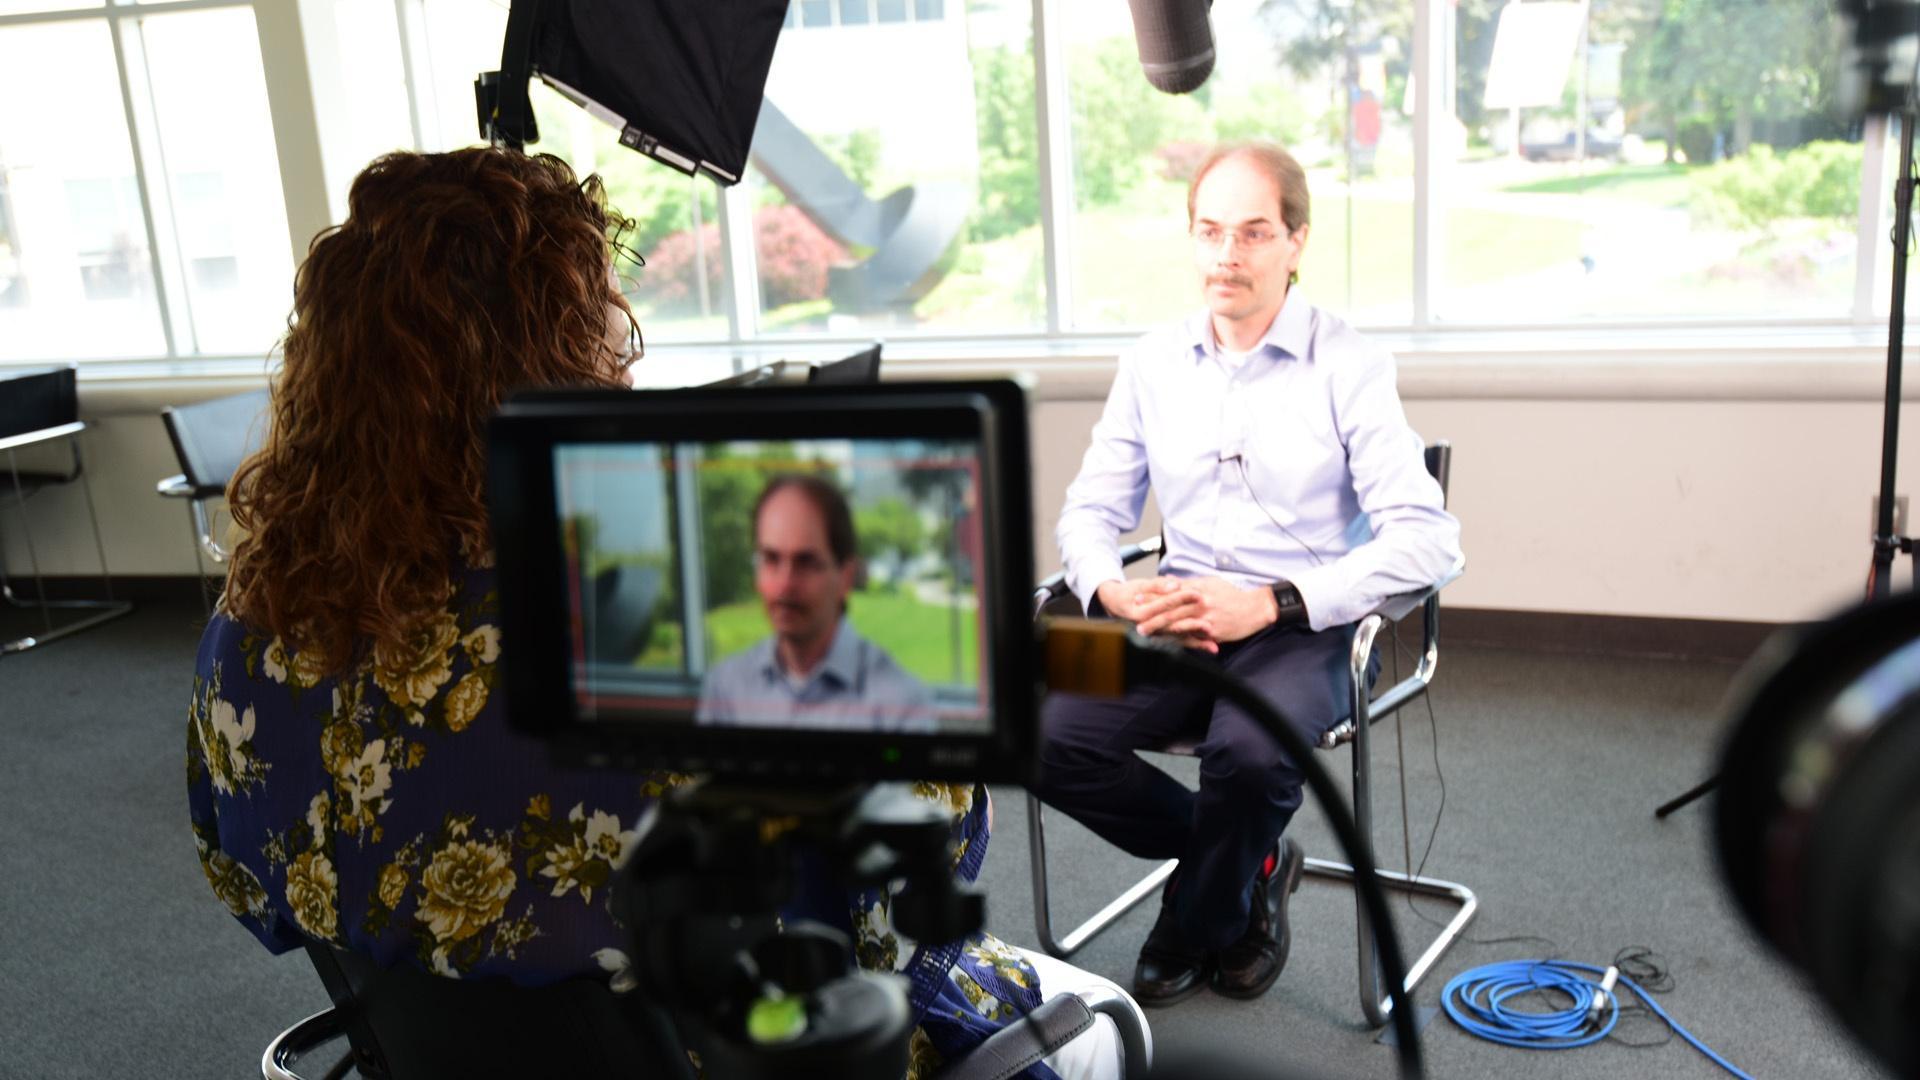 Community filmmaker Paul Dobbs being interviewed by WNED-TV